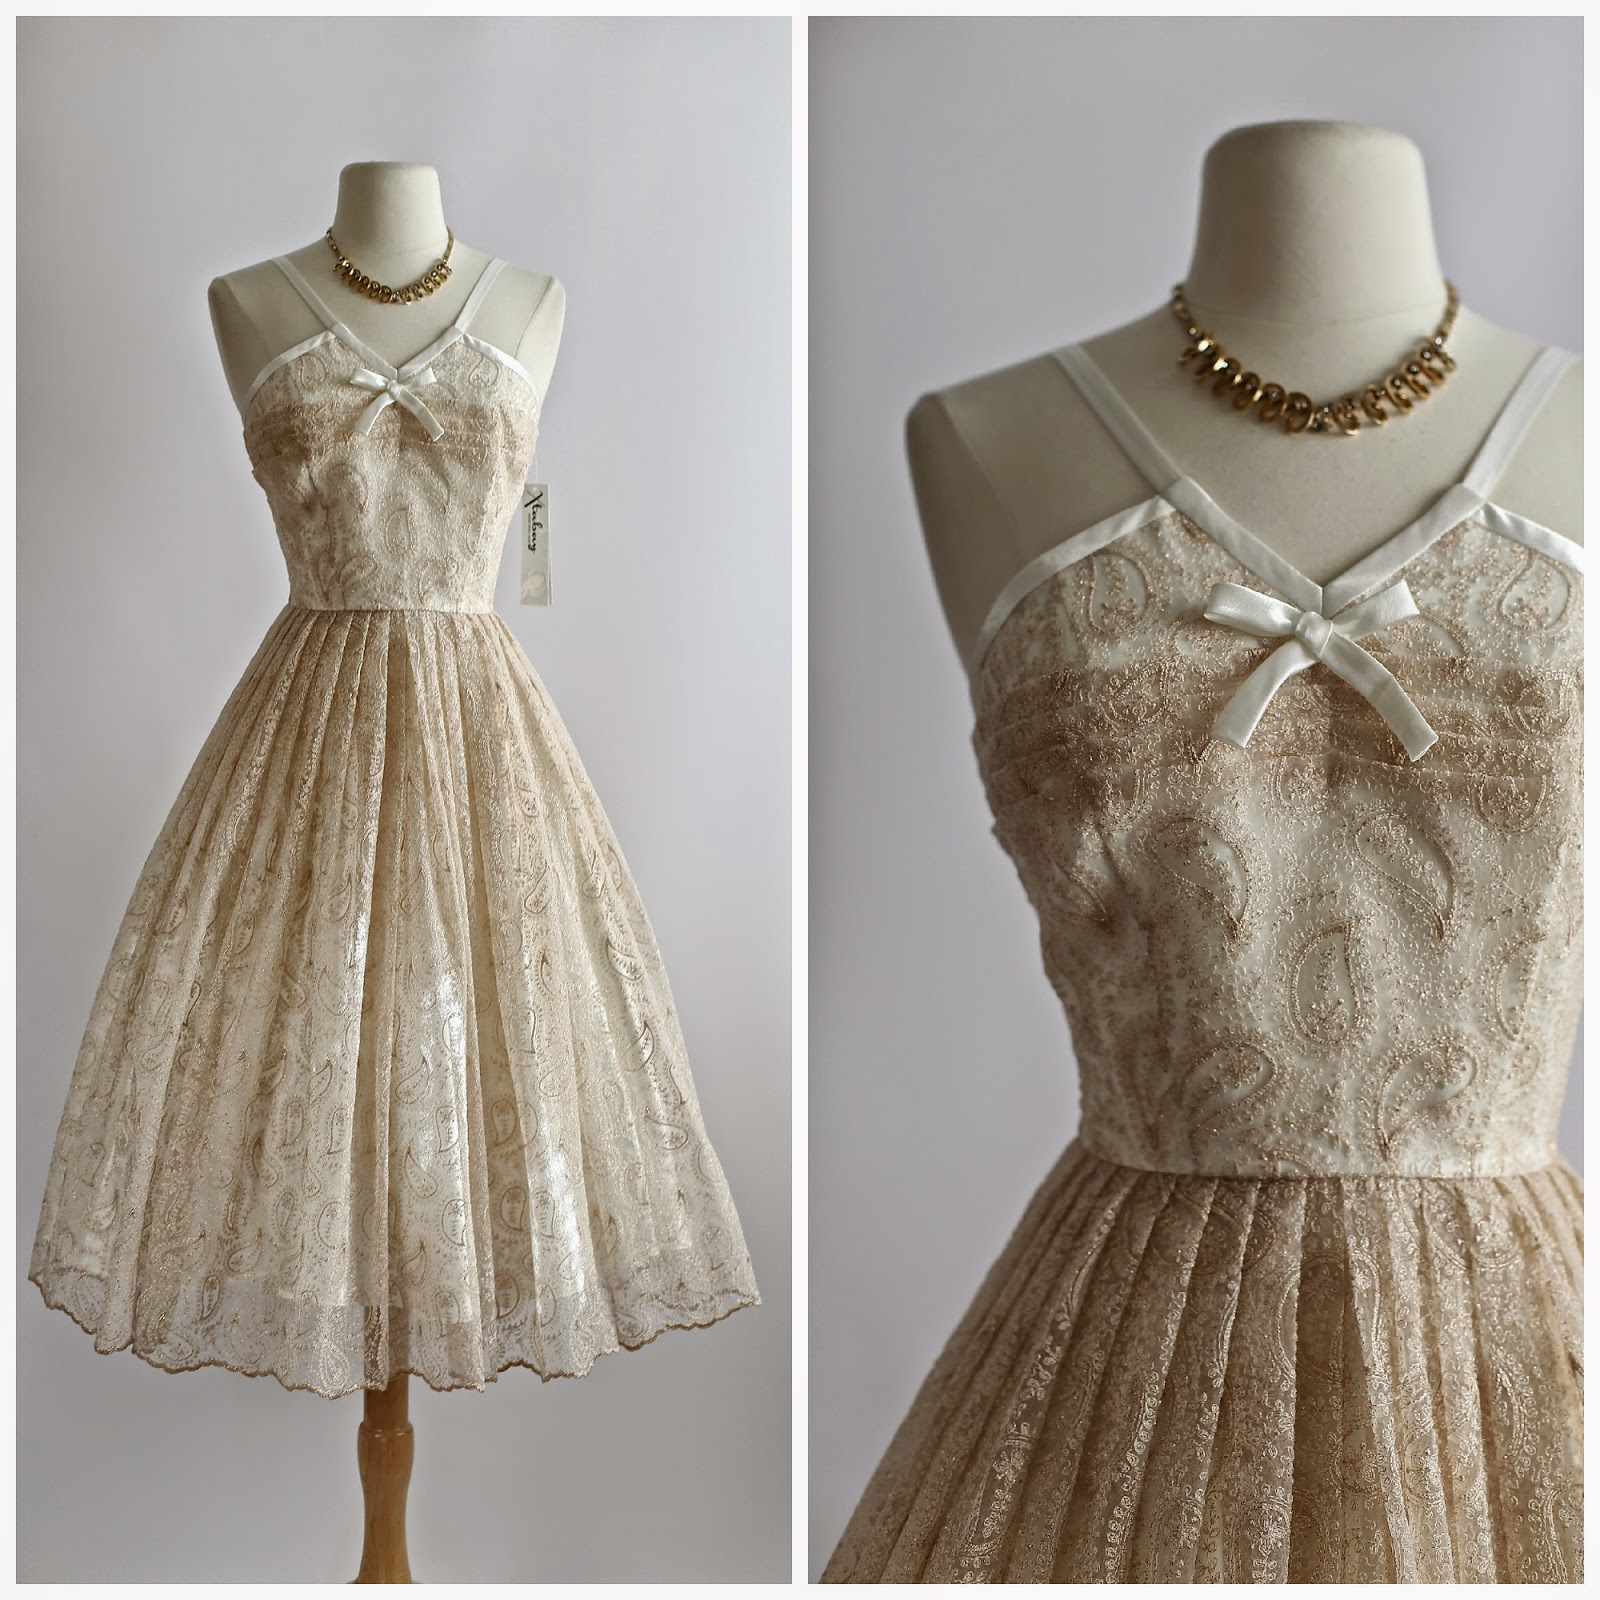 Vintage Wedding Dresses Portland Oregon: 1950's Style Rose Gold Embroidered Wedding Or Reception